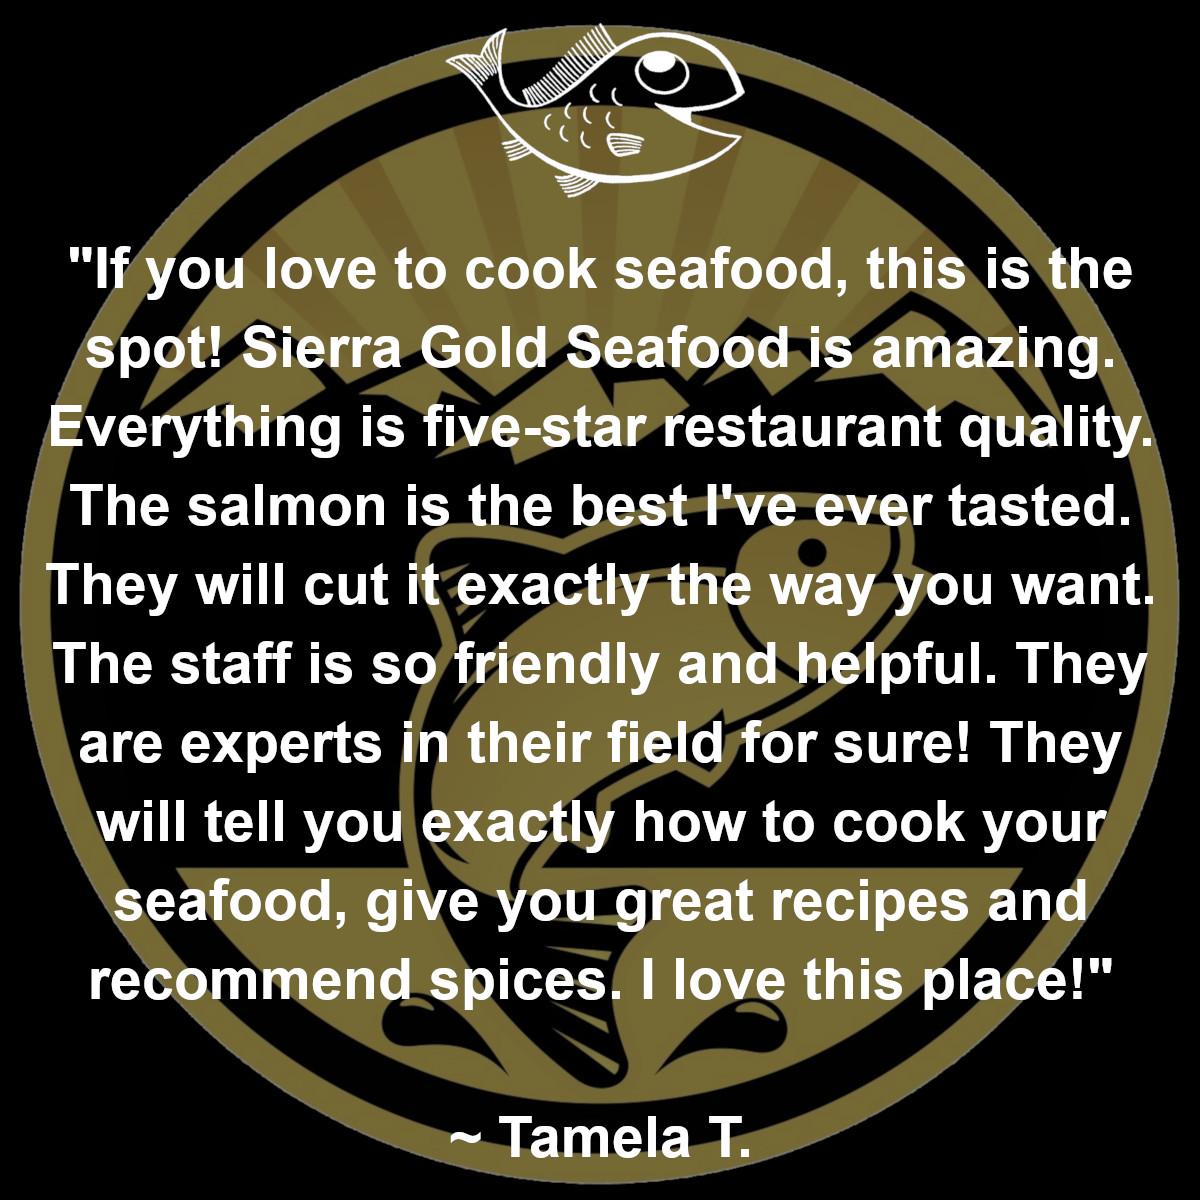 Tamela T_SGS